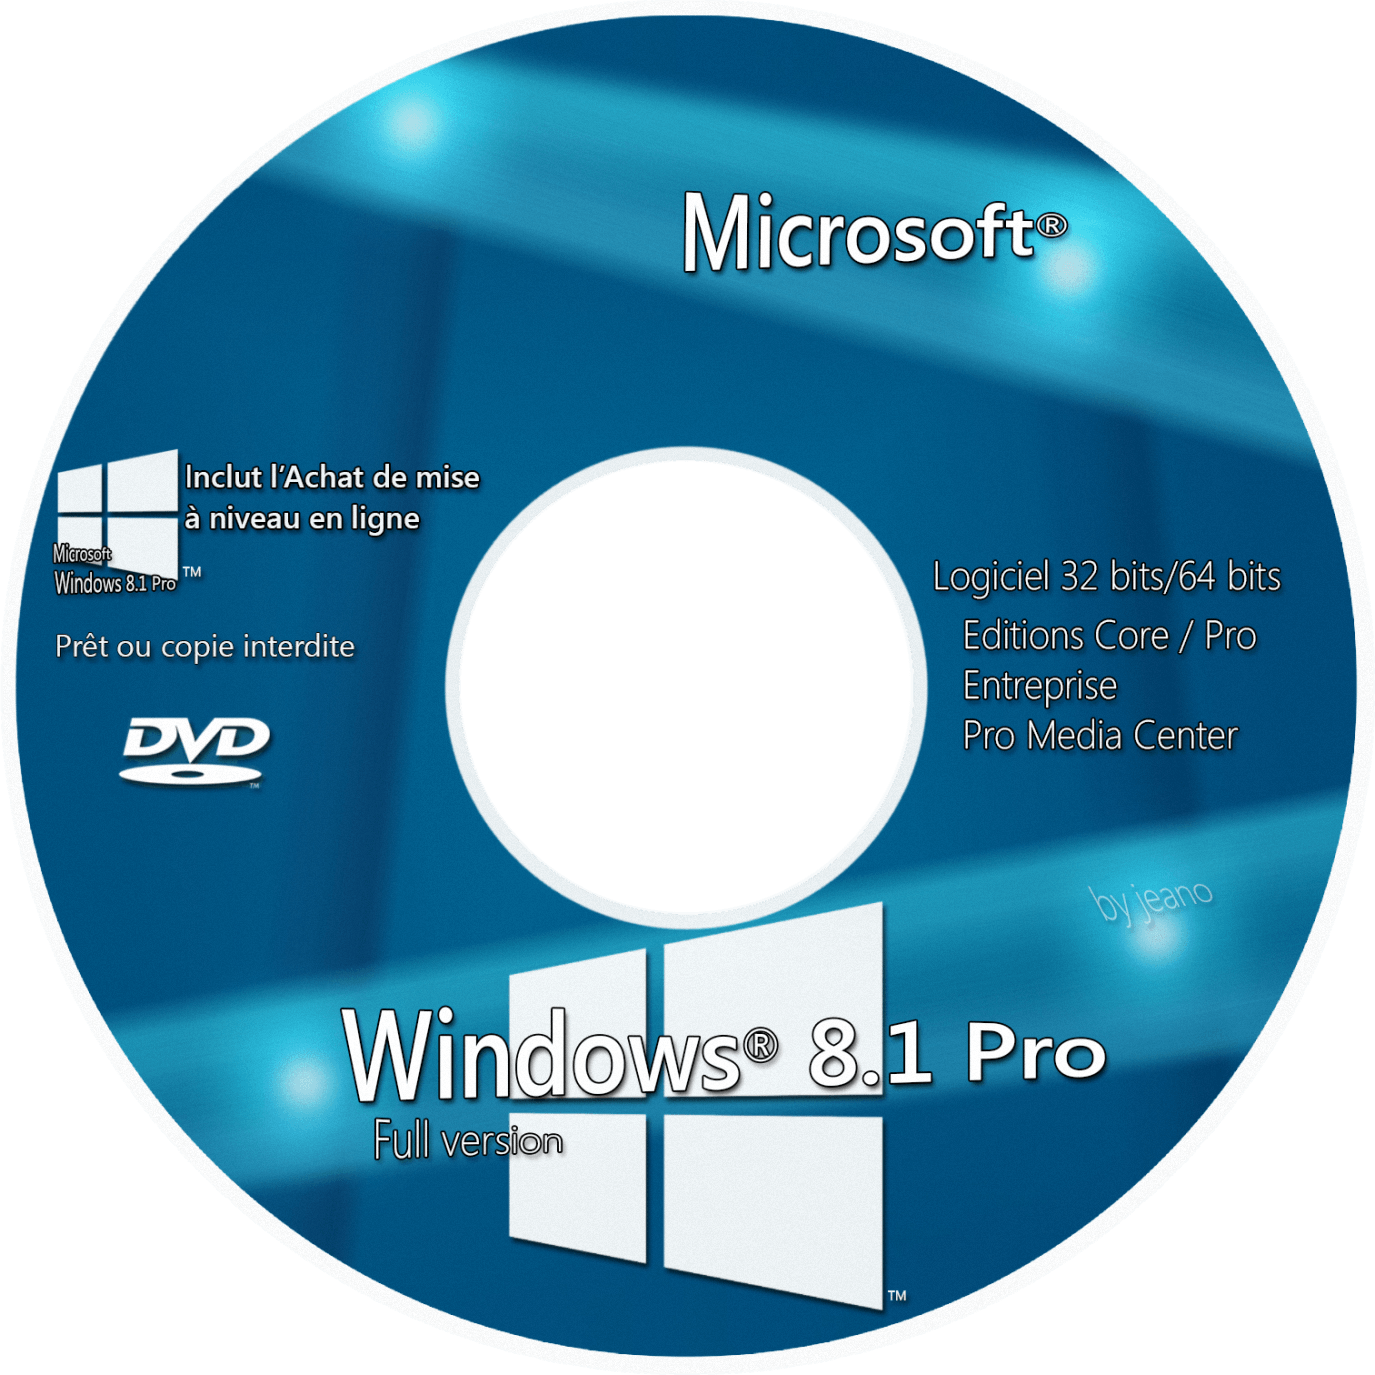 windows 8.1 pro oem torrent